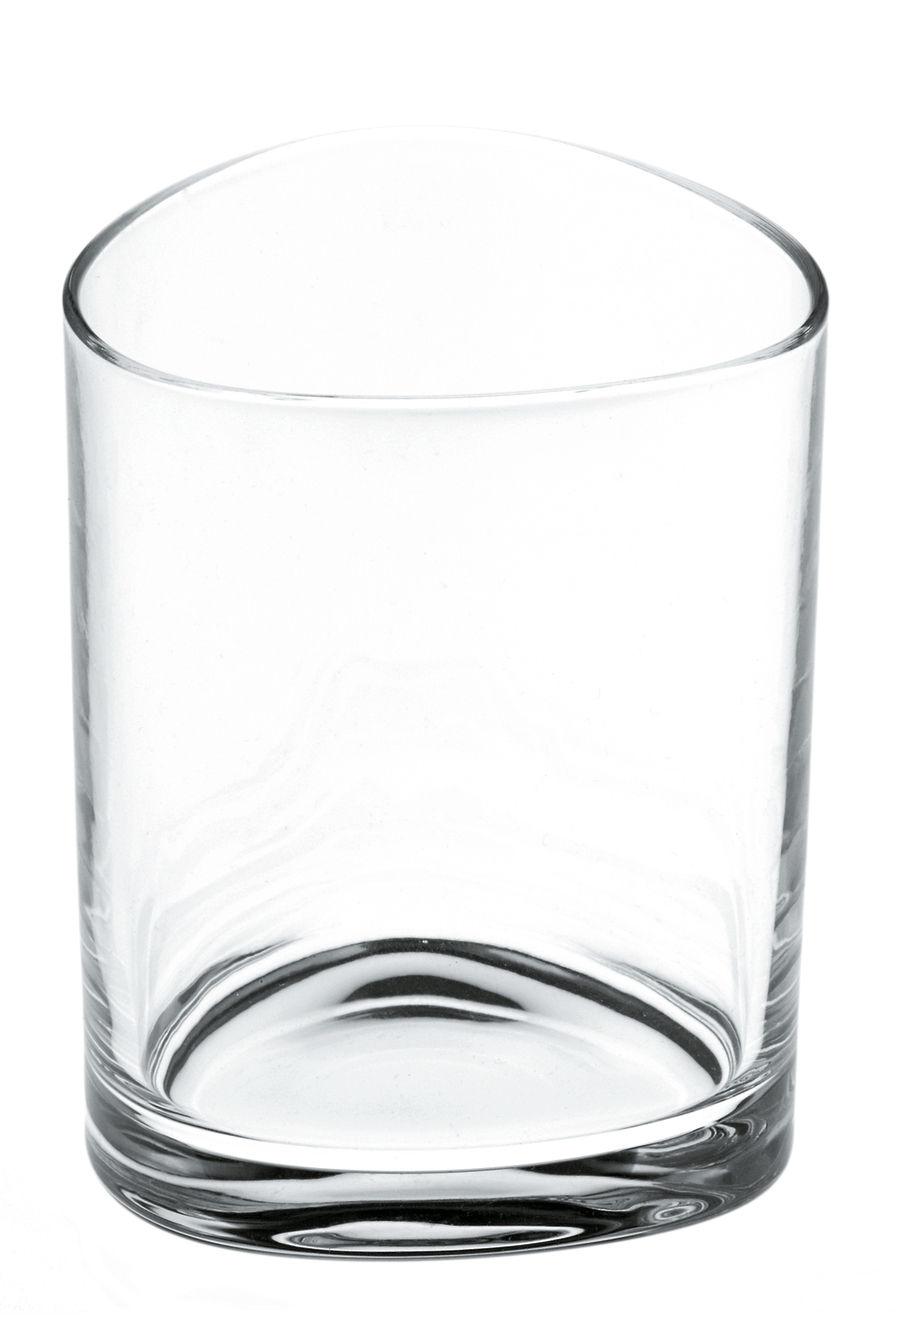 Arts de la table - Verres  - Verre à eau Colombina - Alessi - Cristal transparent -  H 9 cm - Verre